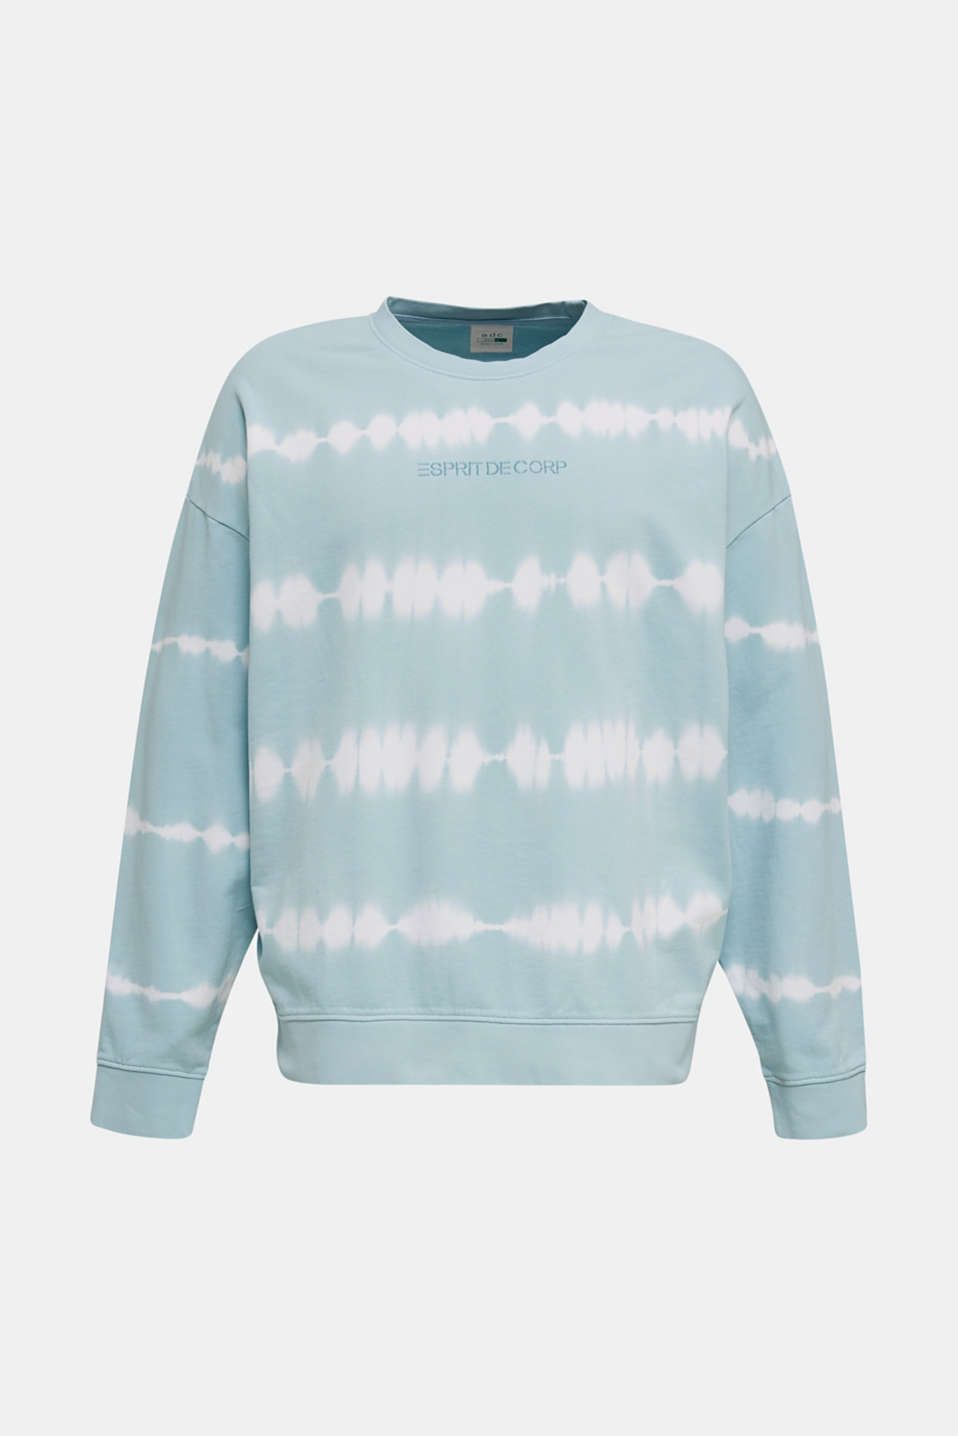 Batik sweatshirt with organic cotton, LIGHT BLUE 4, detail image number 7